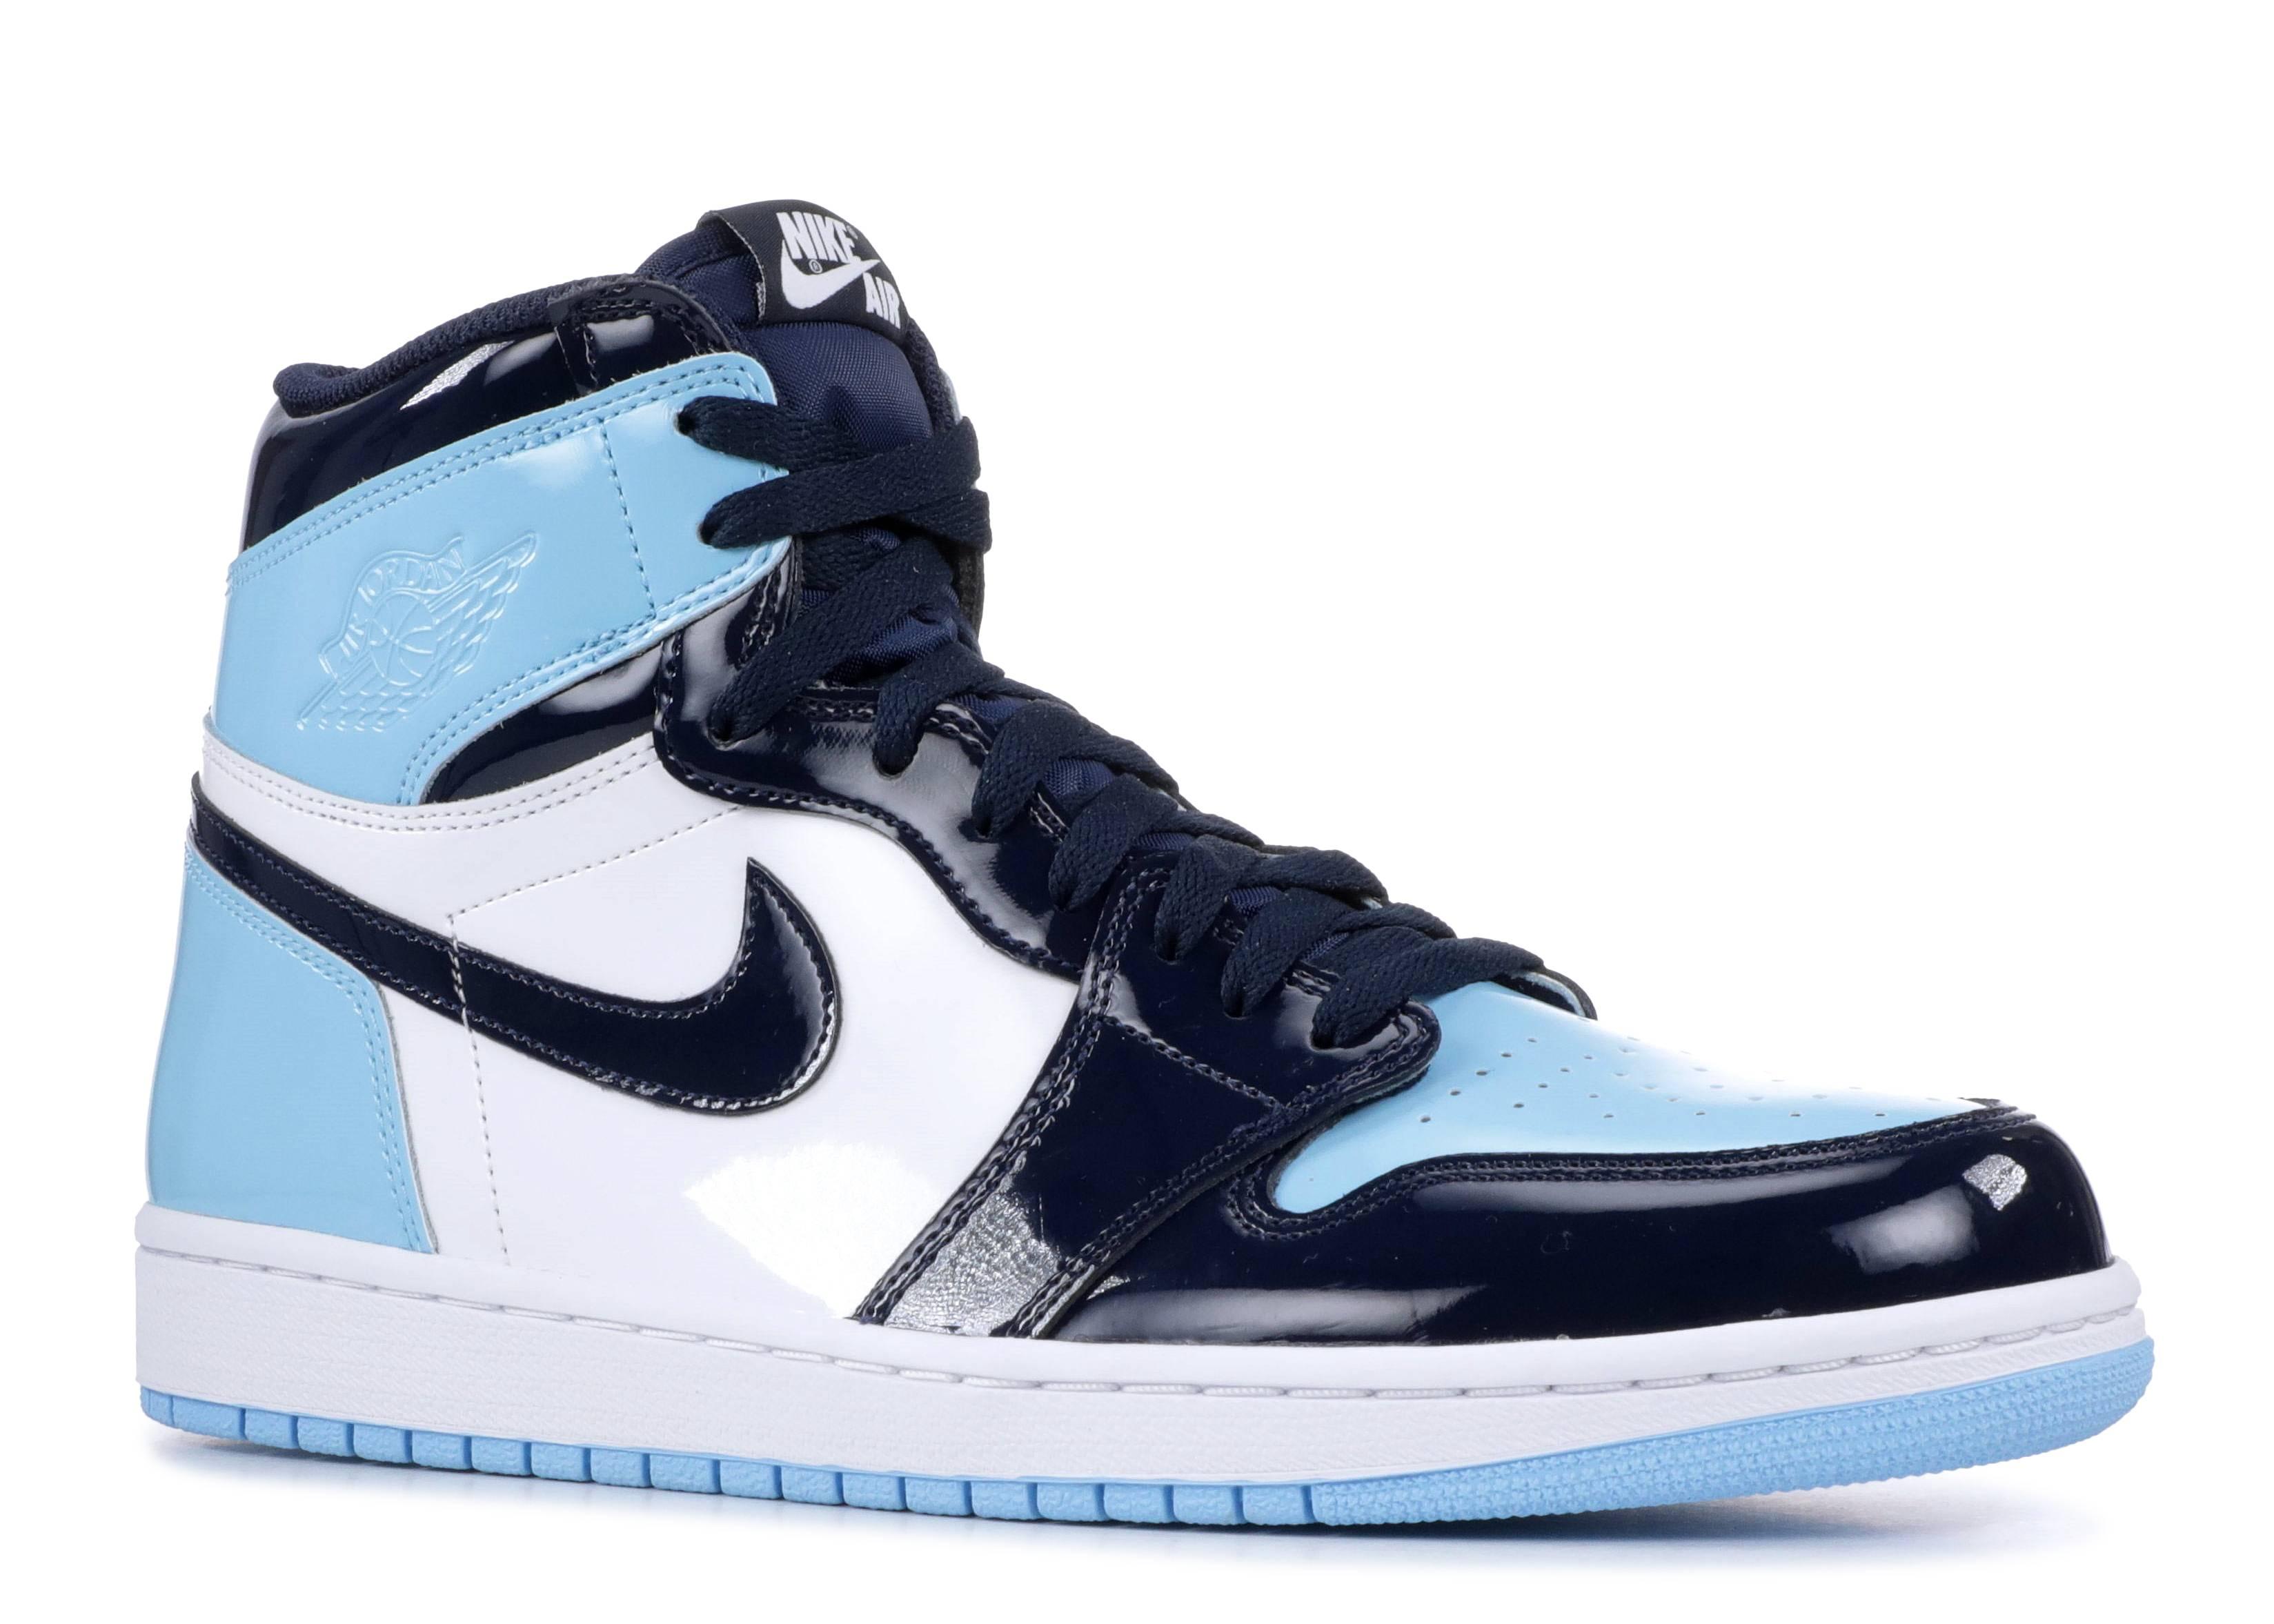 Wmns Air Jordan 1 Retro High OG 'Blue Chill'